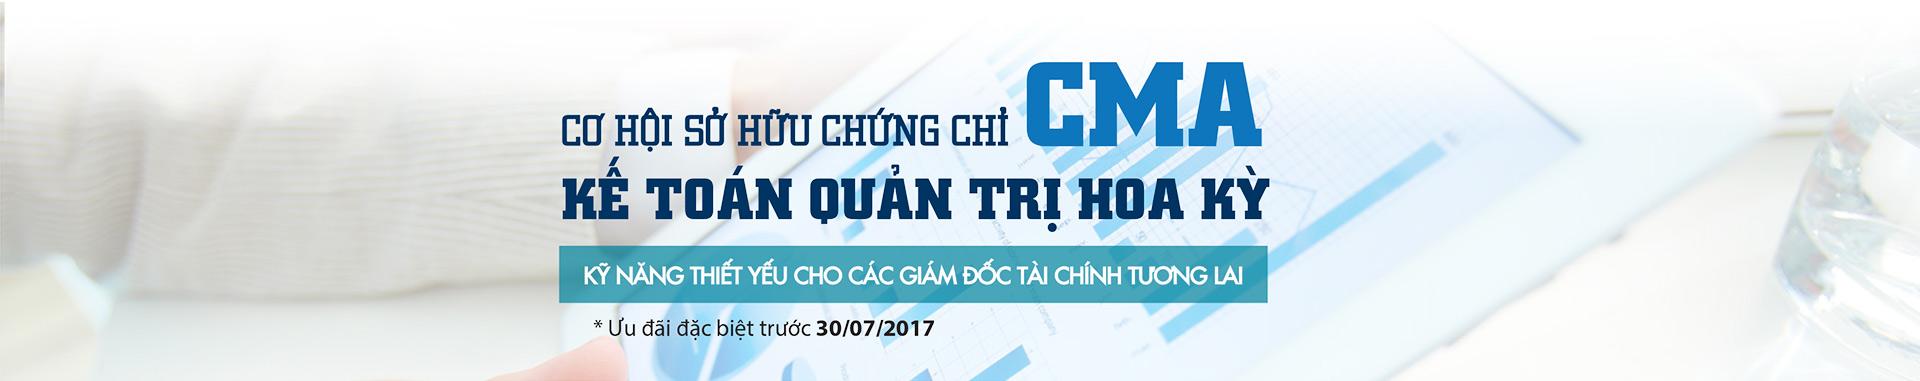 cma-bn